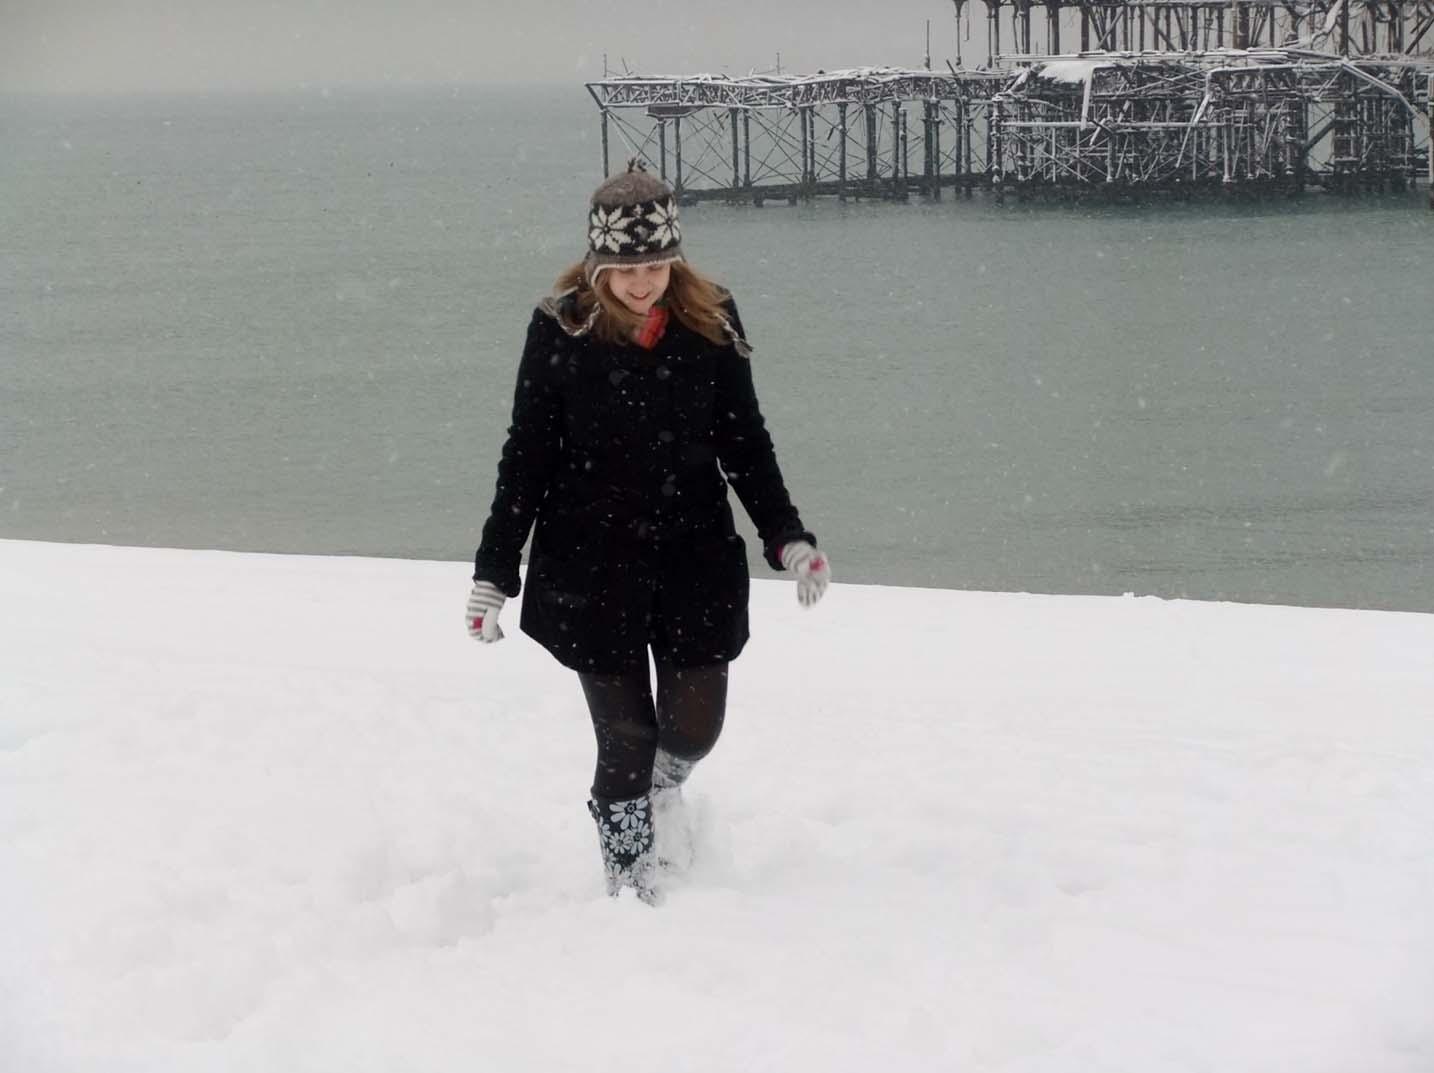 Brighton pier winter